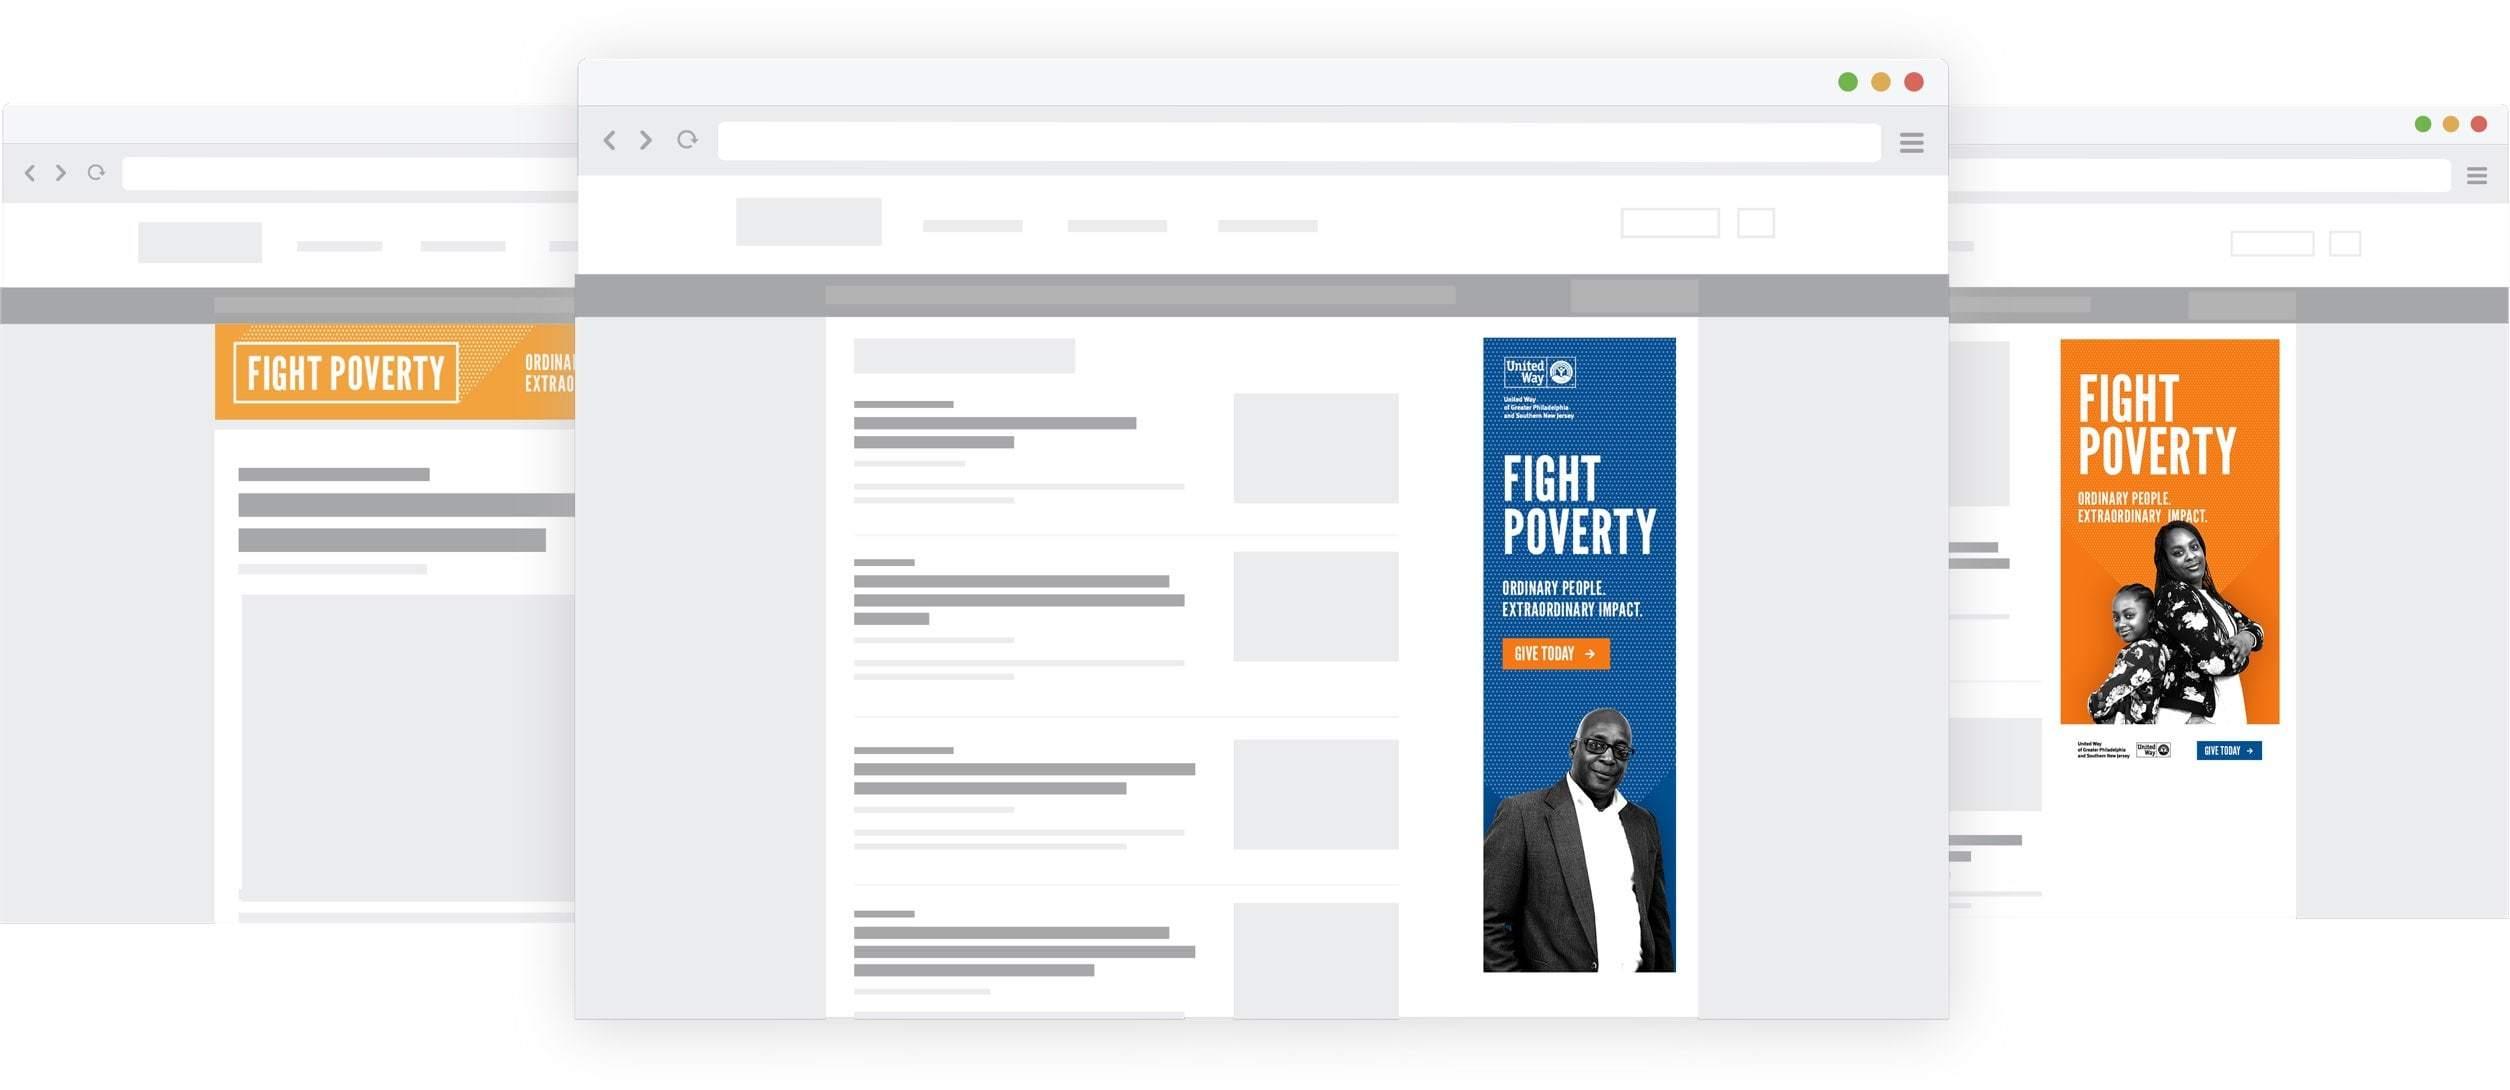 Uwpsnj2018 Web Banners Fullwidth